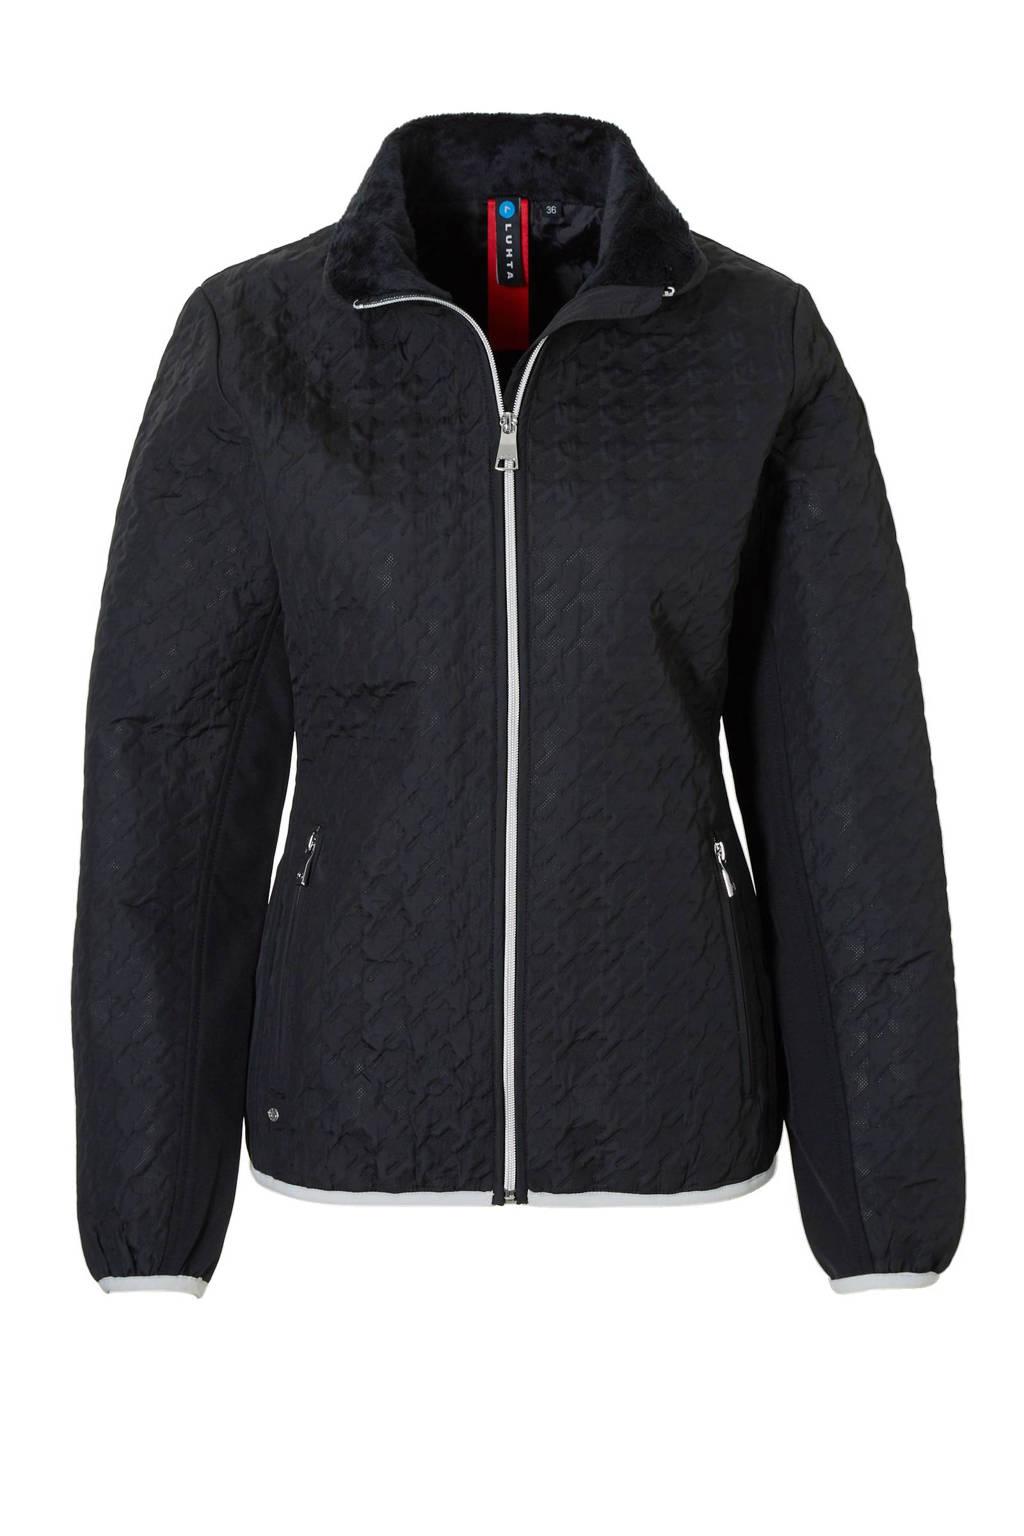 Luhta Beatrice outdoor jas, Zwart